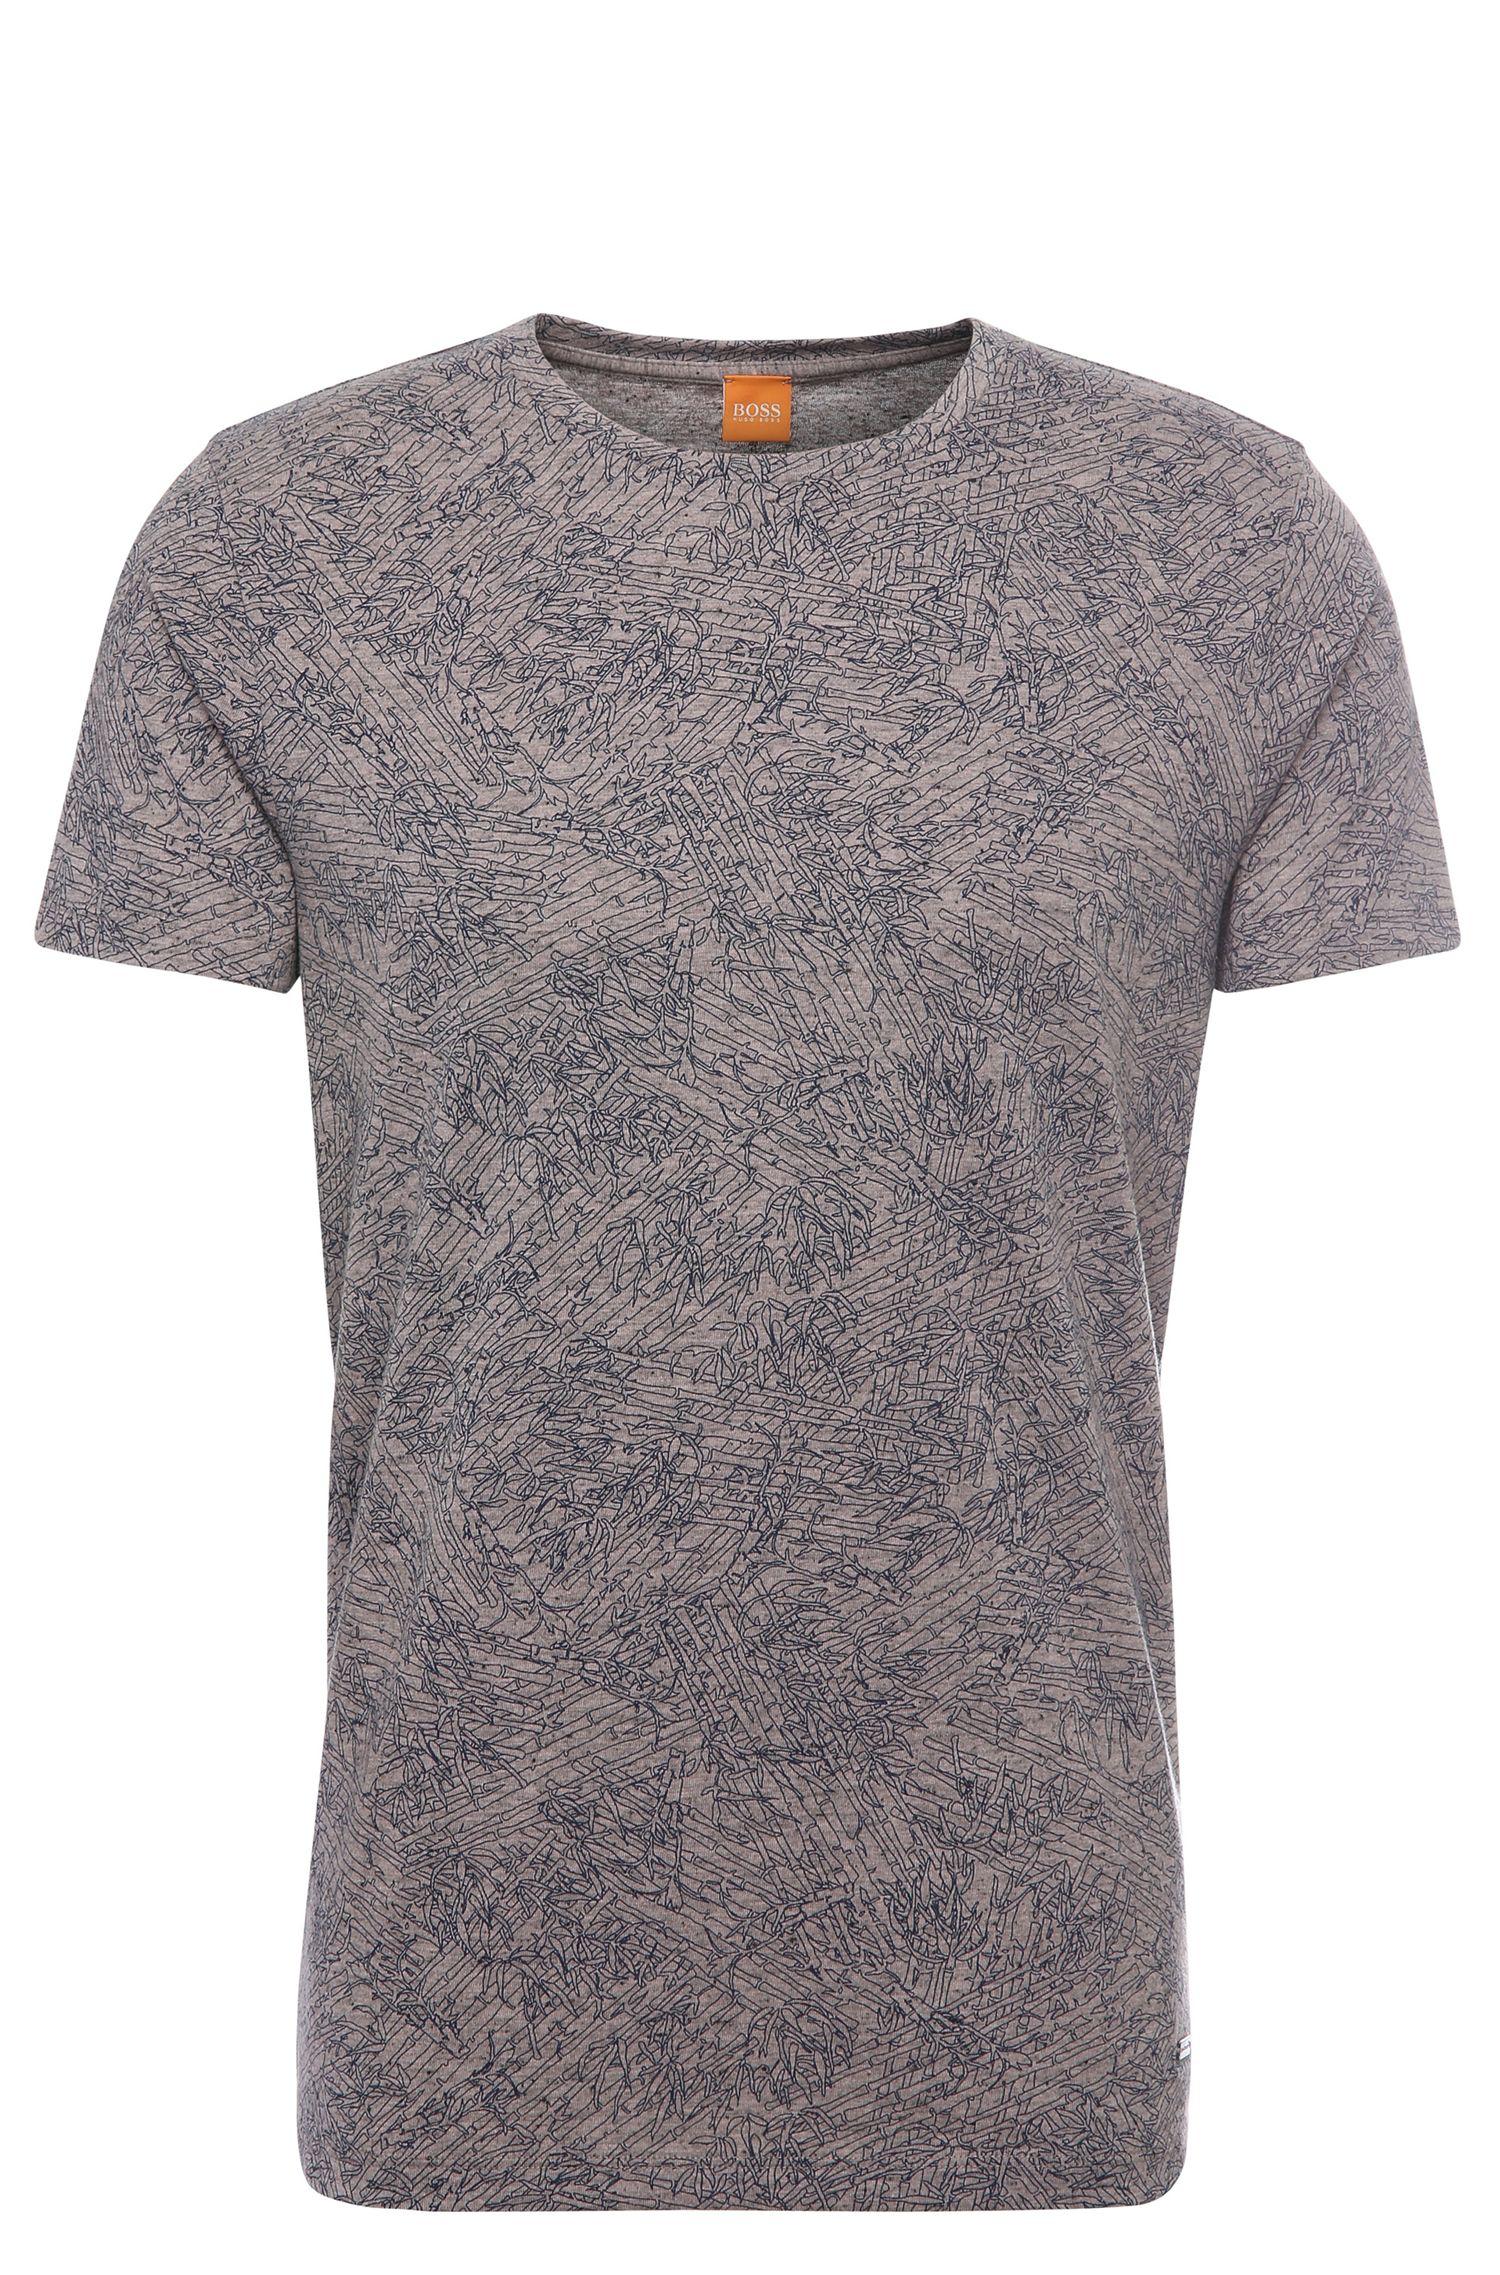 'Tauryon' | Cotton Modal Blend Printed T-Shirt